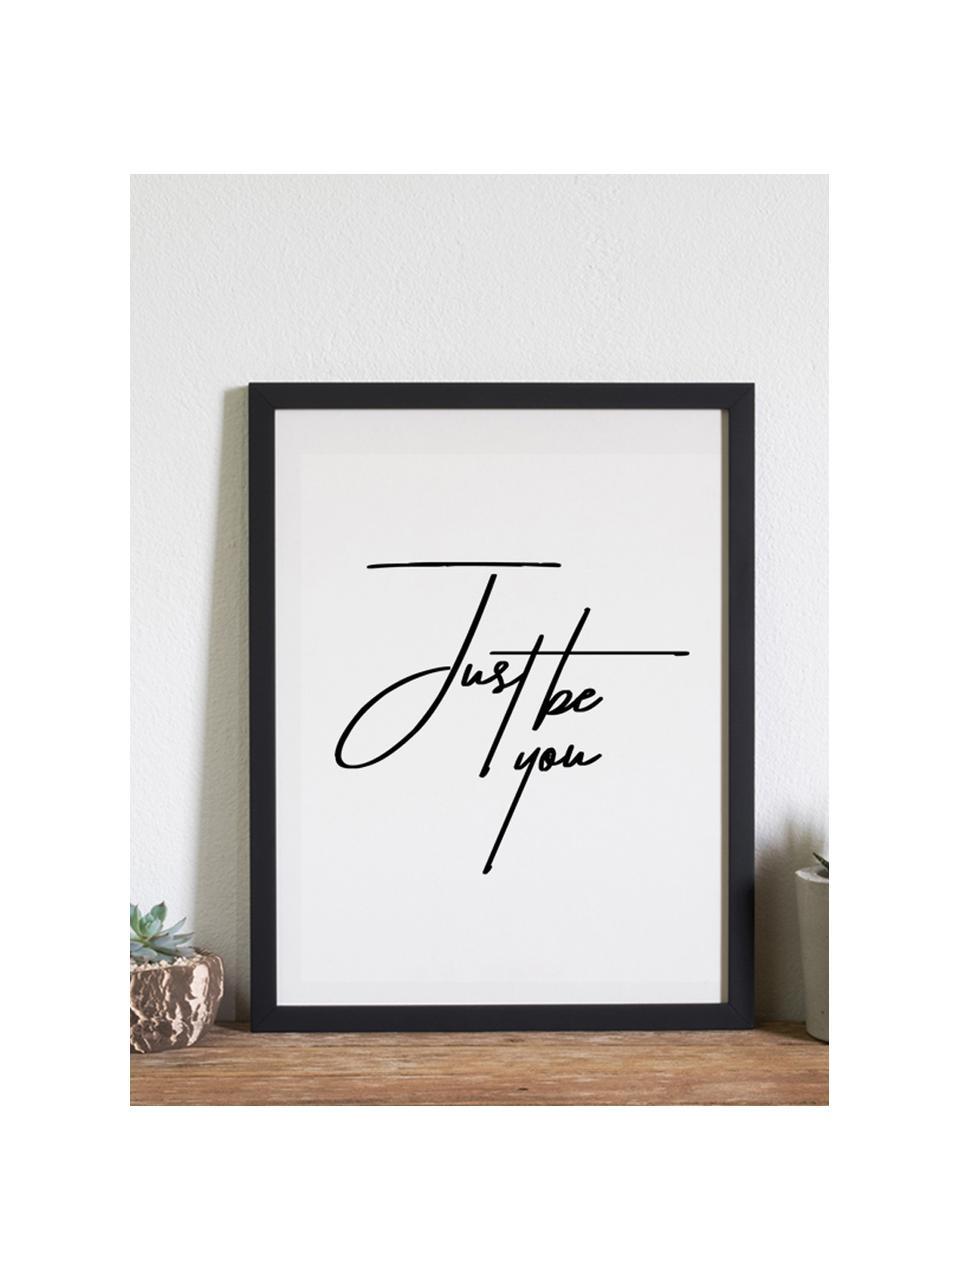 Stampa digitale incorniciata Just be You, Immagine: stampa digitale su carta,, Cornice: legno verniciato, Foto: nero, bianco Cornice: nero, Larg. 33 x Alt. 43 cm